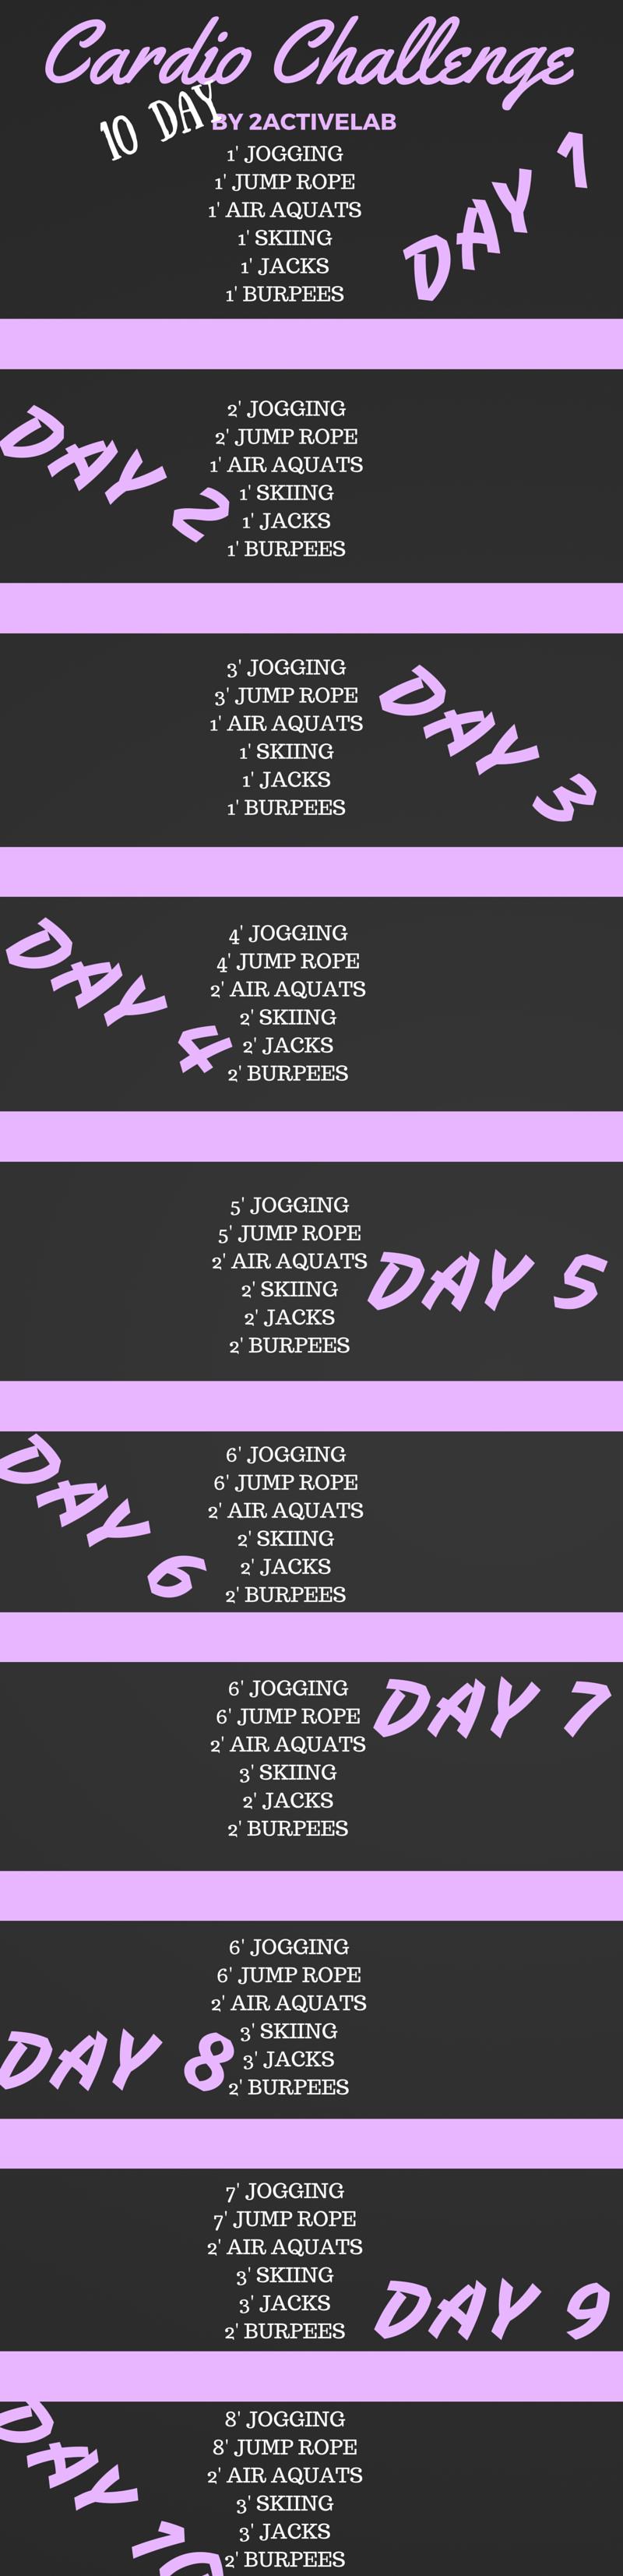 10 Cardio Challenge BY 2ACTIVELAB #workout #cardio #challenge #train #training #trainhard #loseweight #lose #weight #weightloss (1)